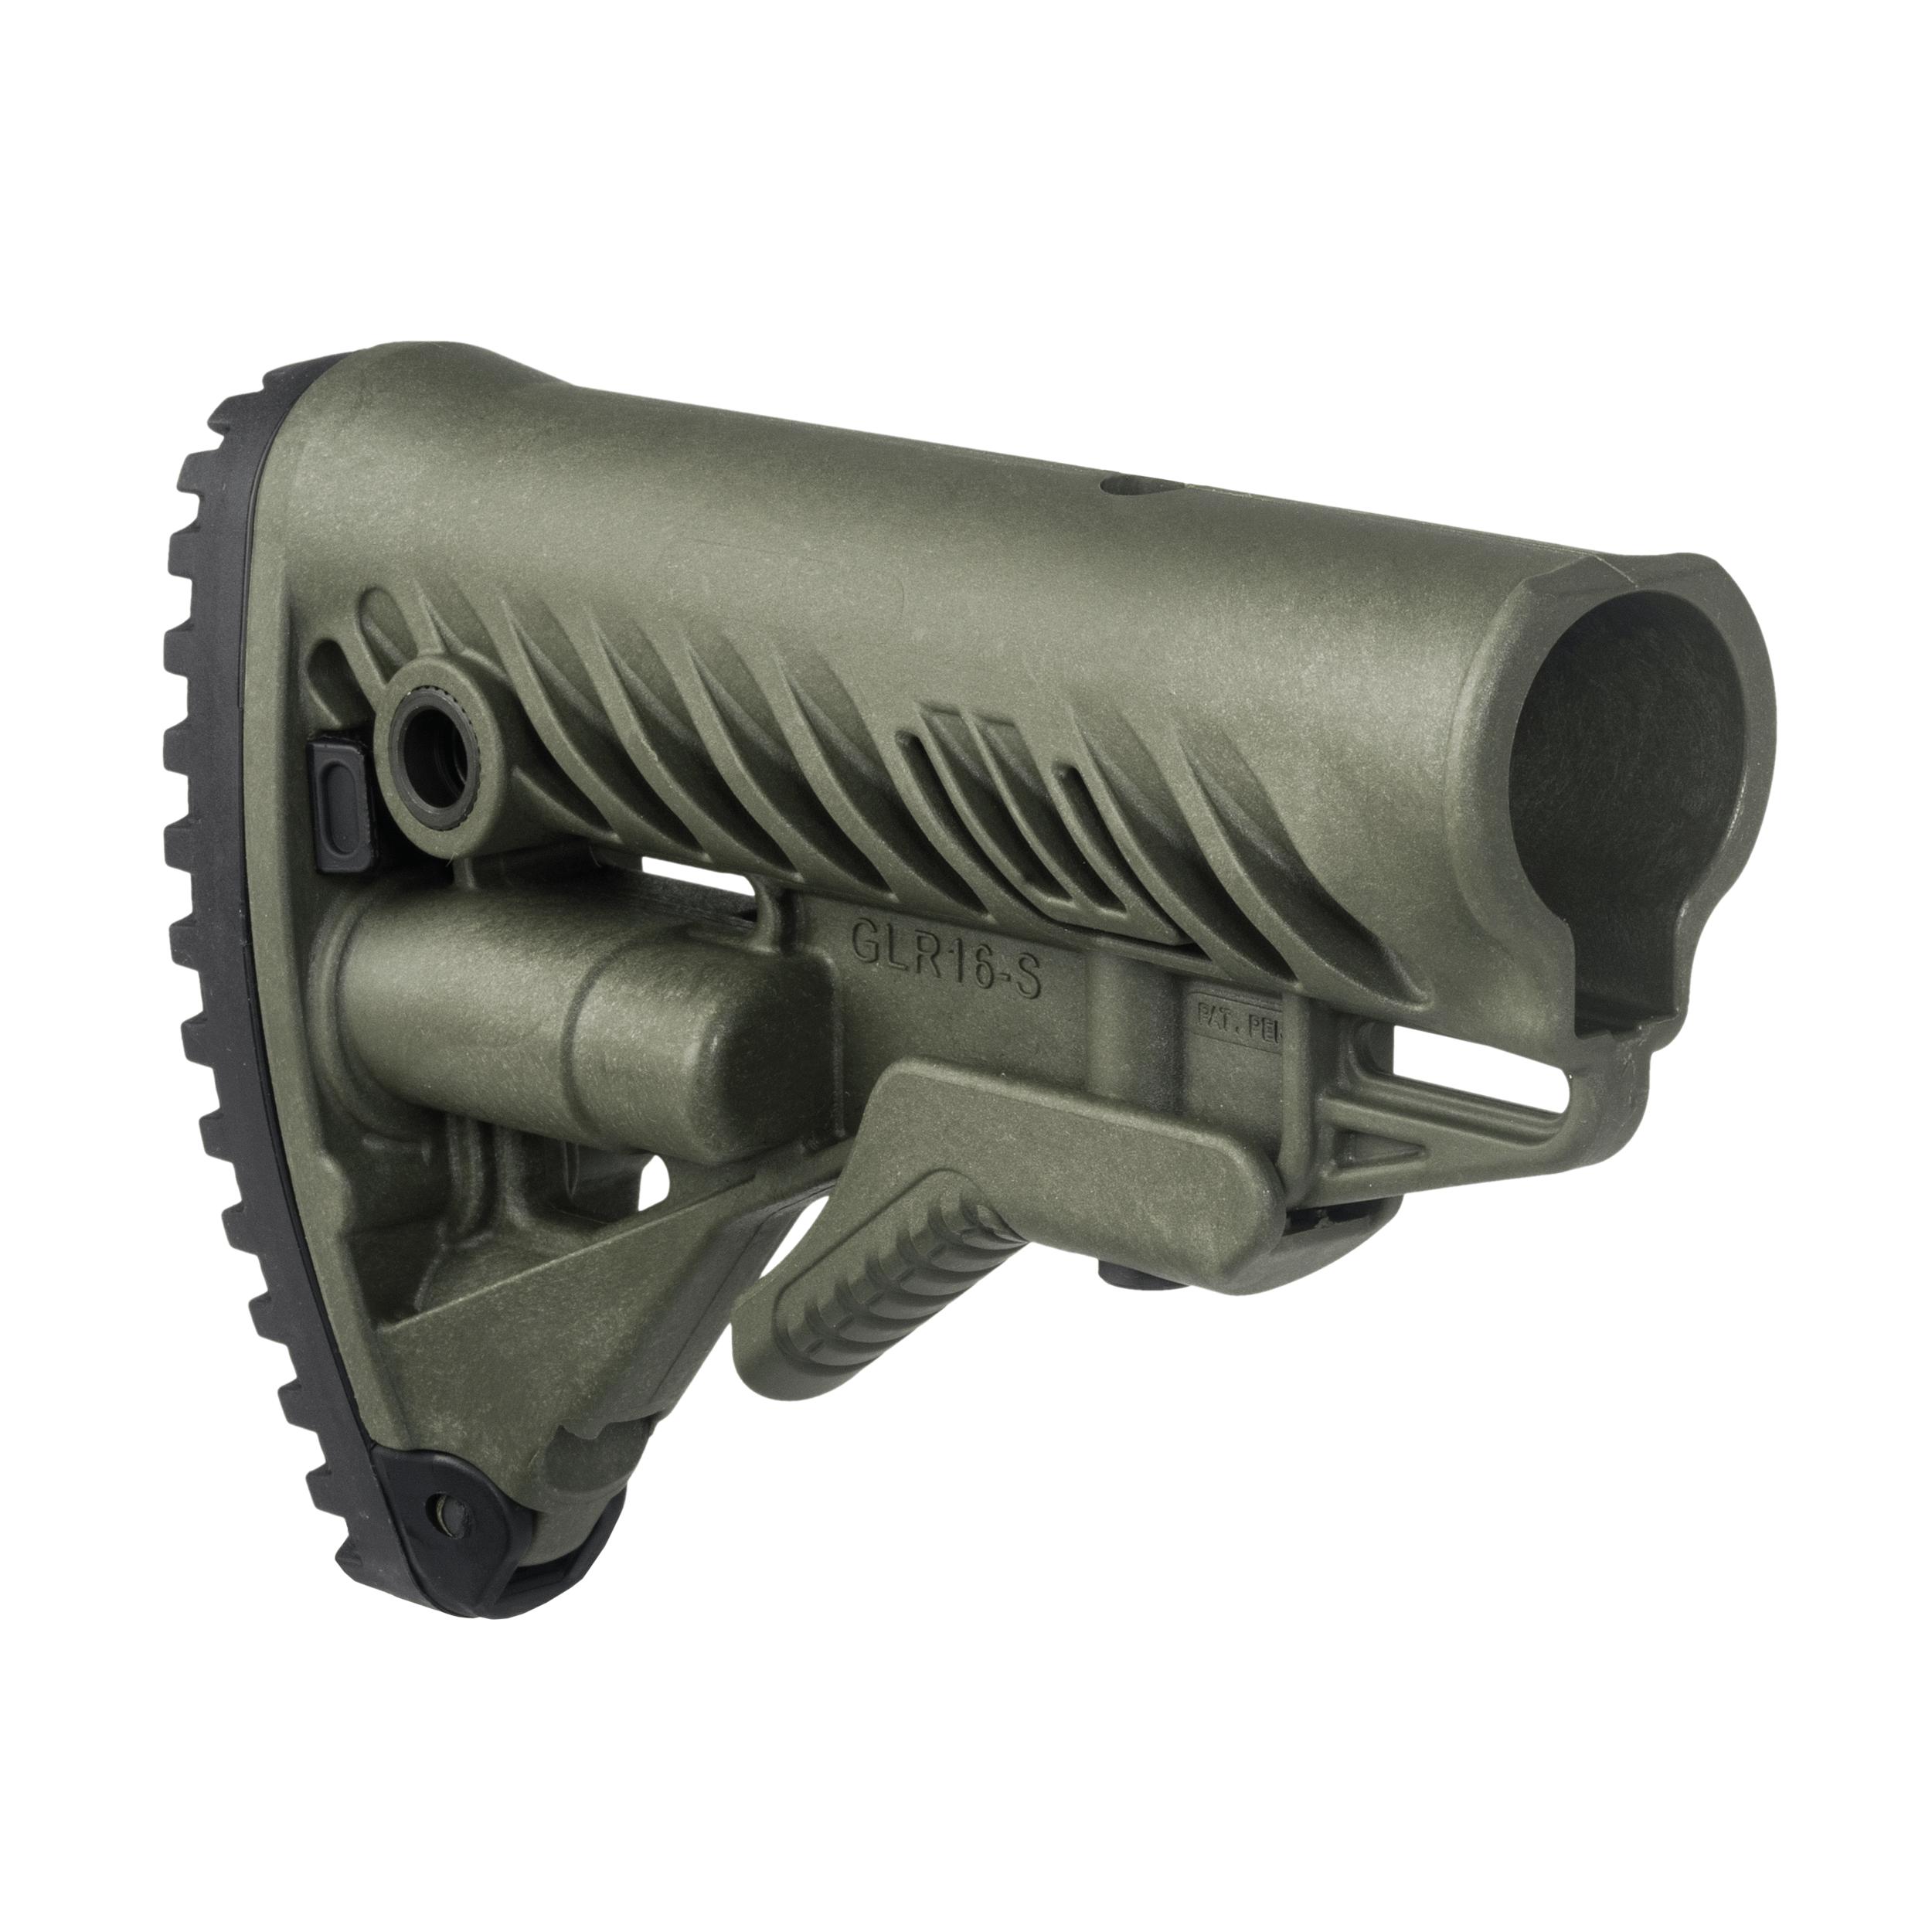 Buttstock AR15 / M16 / M4 Style